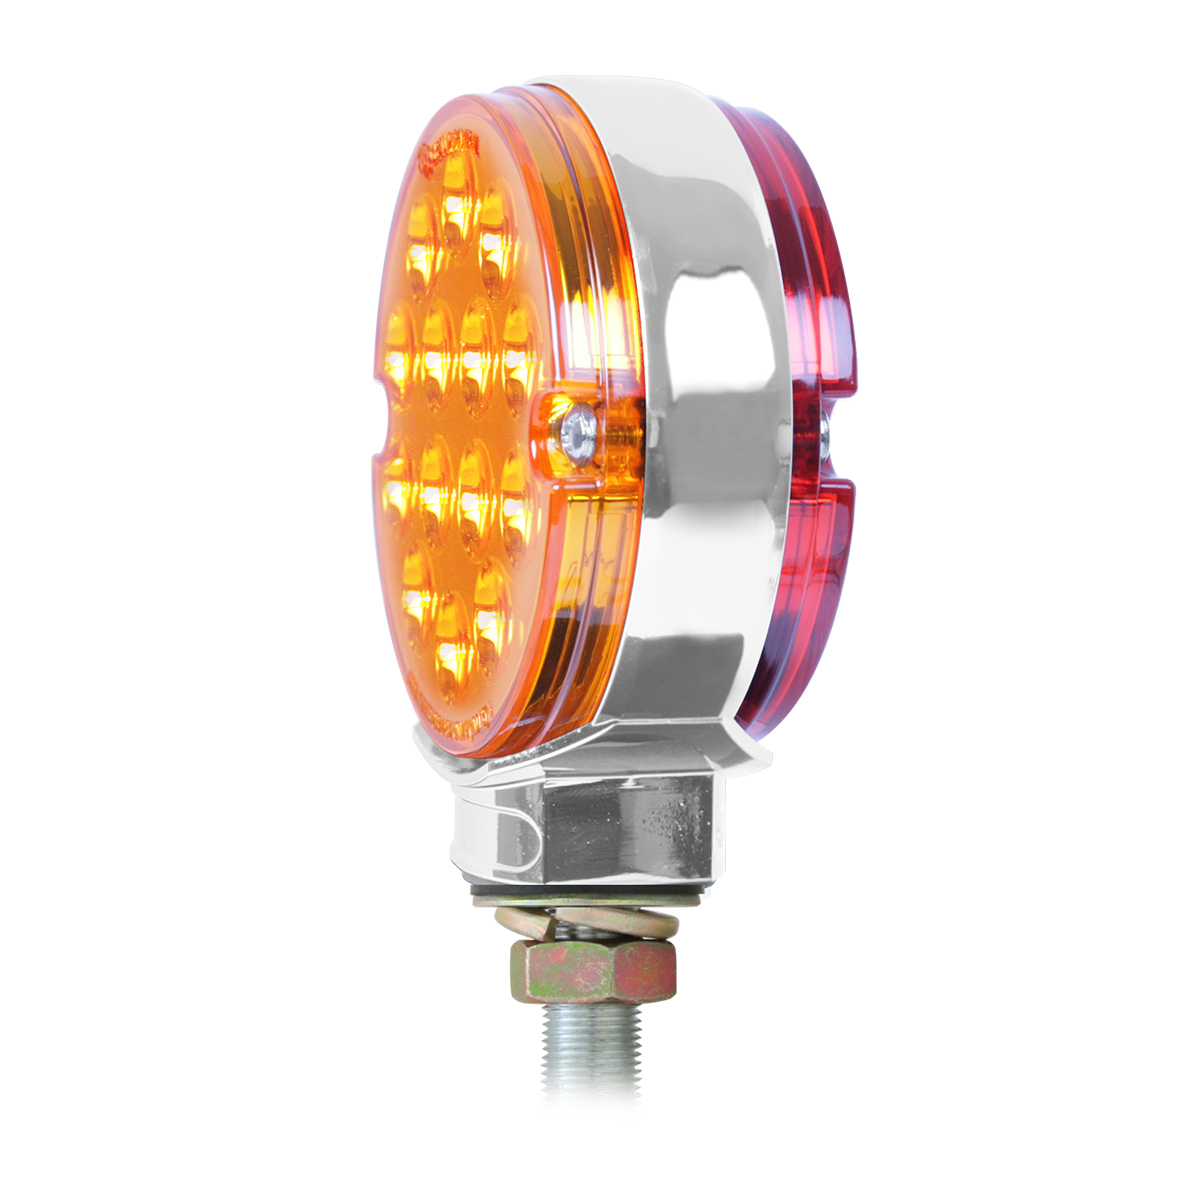 17 LED Double Face Light Turn Signal Semi Truck Fender Amber LED//Red LED